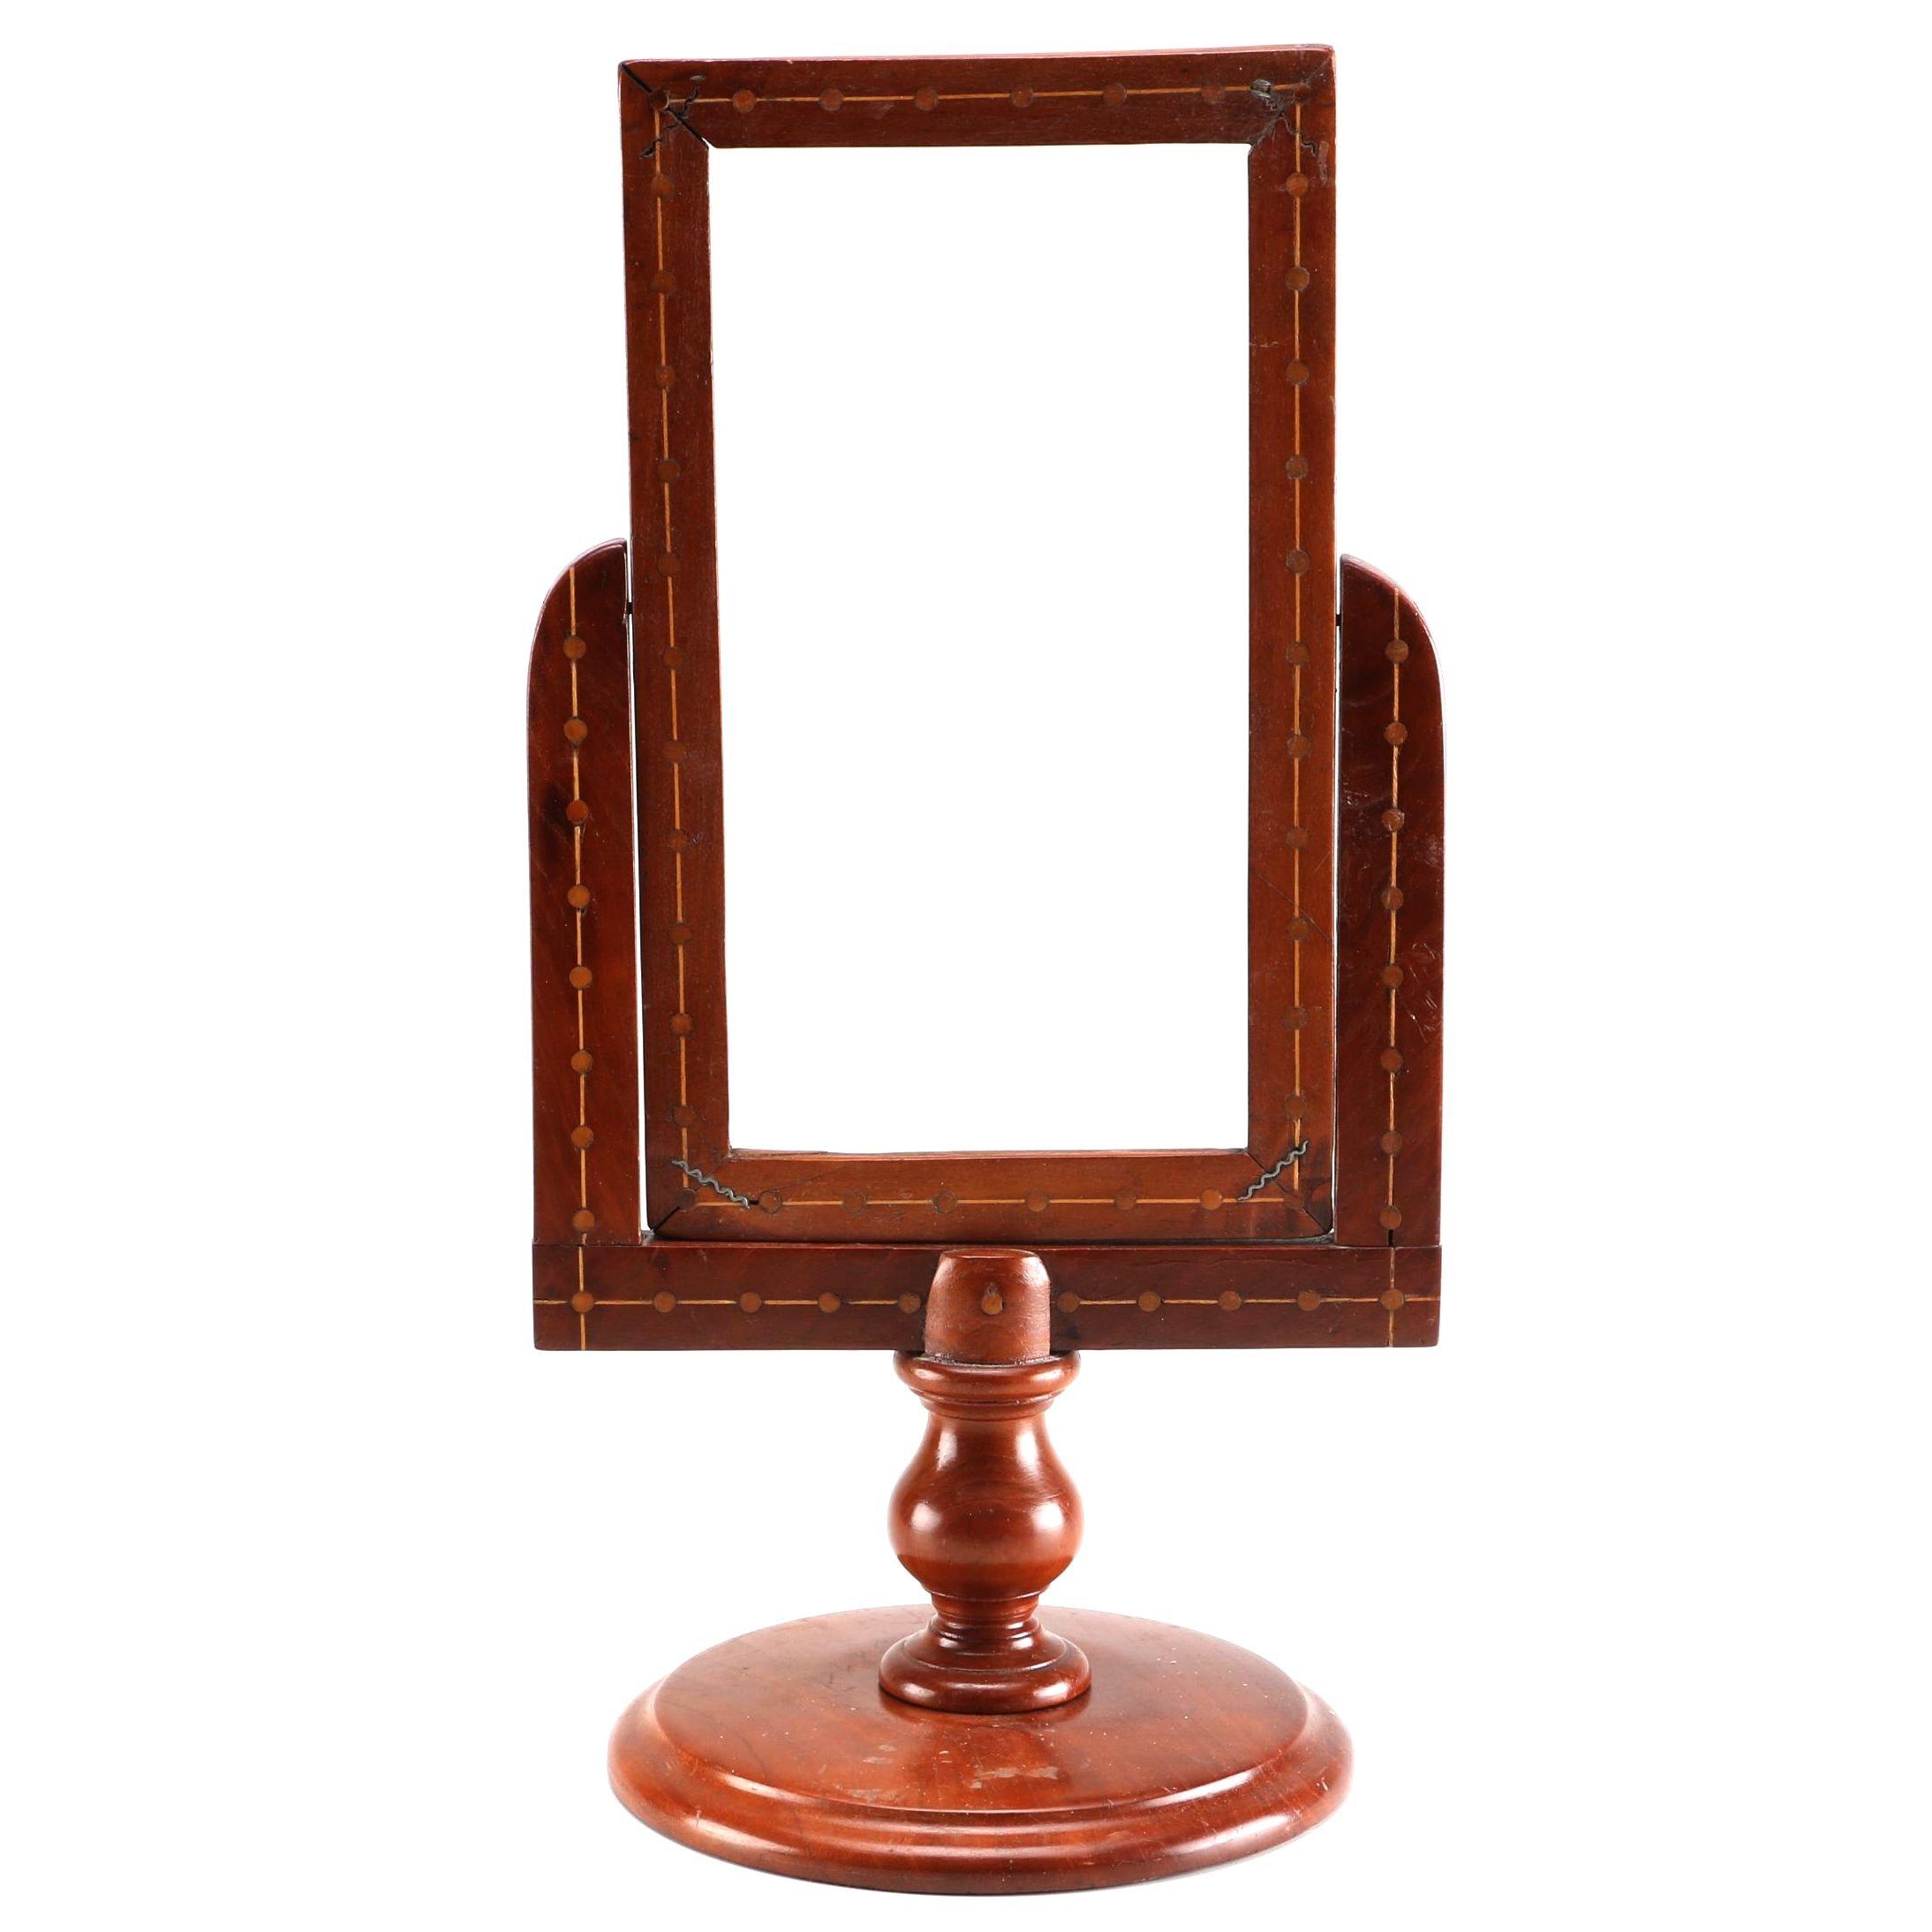 Inlaid Wooden Vanity Mirror Stand